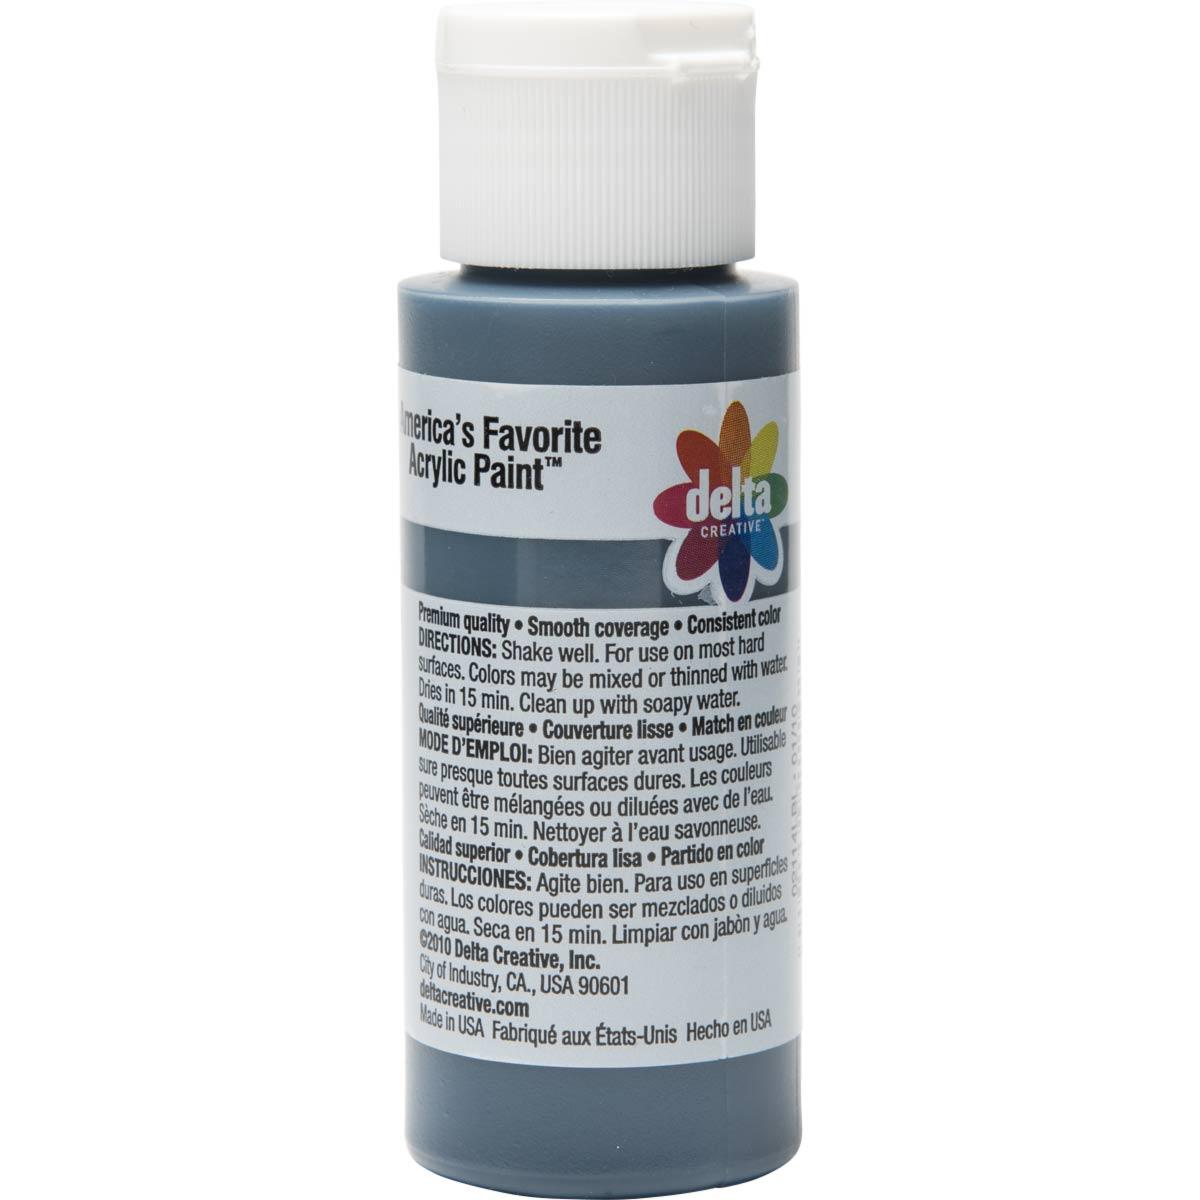 Delta Ceramcoat ® Acrylic Paint - Midnight Blue, 2 oz.